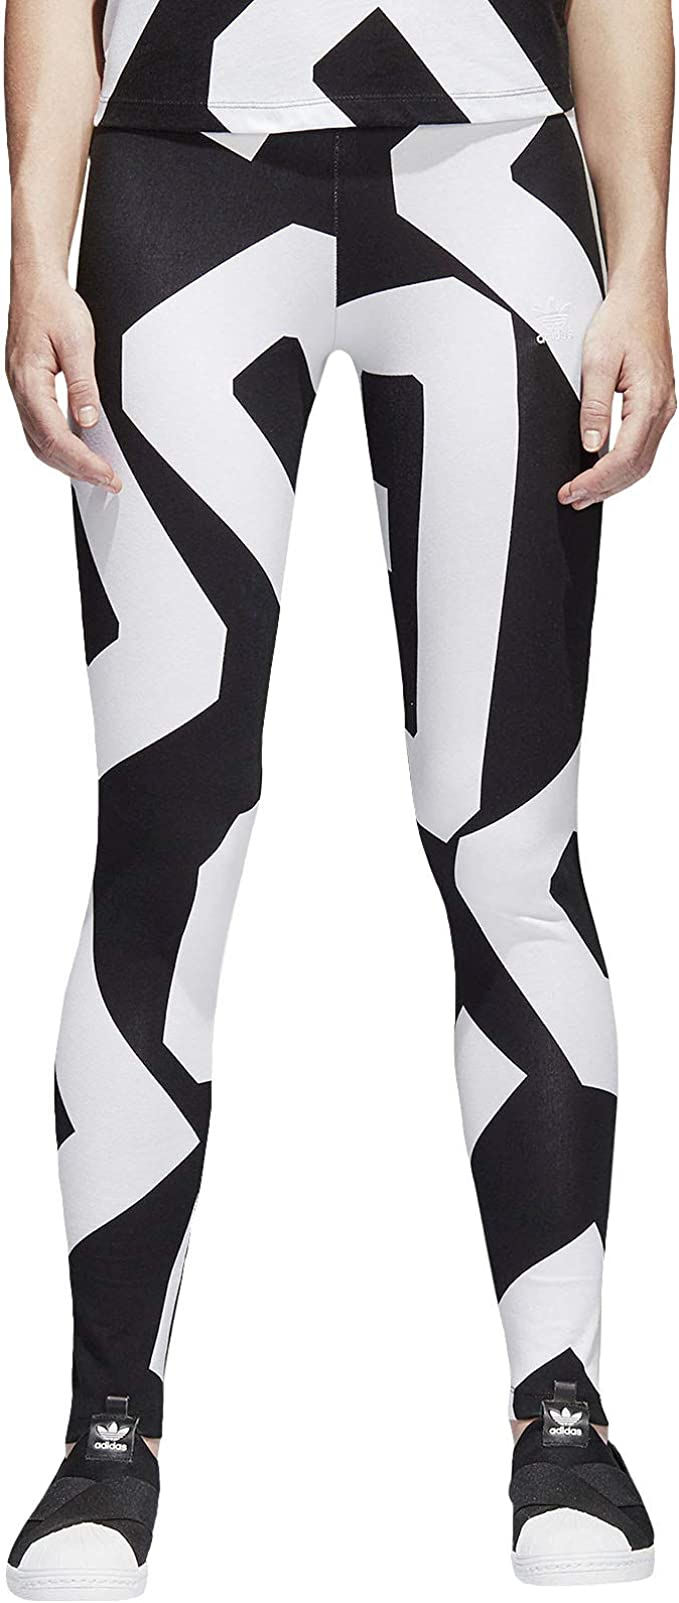 Nuova Zelanda tavola Tirannia  adidas Donna Pantaloni / Leggings Leggings: Amazon.it: Abbigliamento